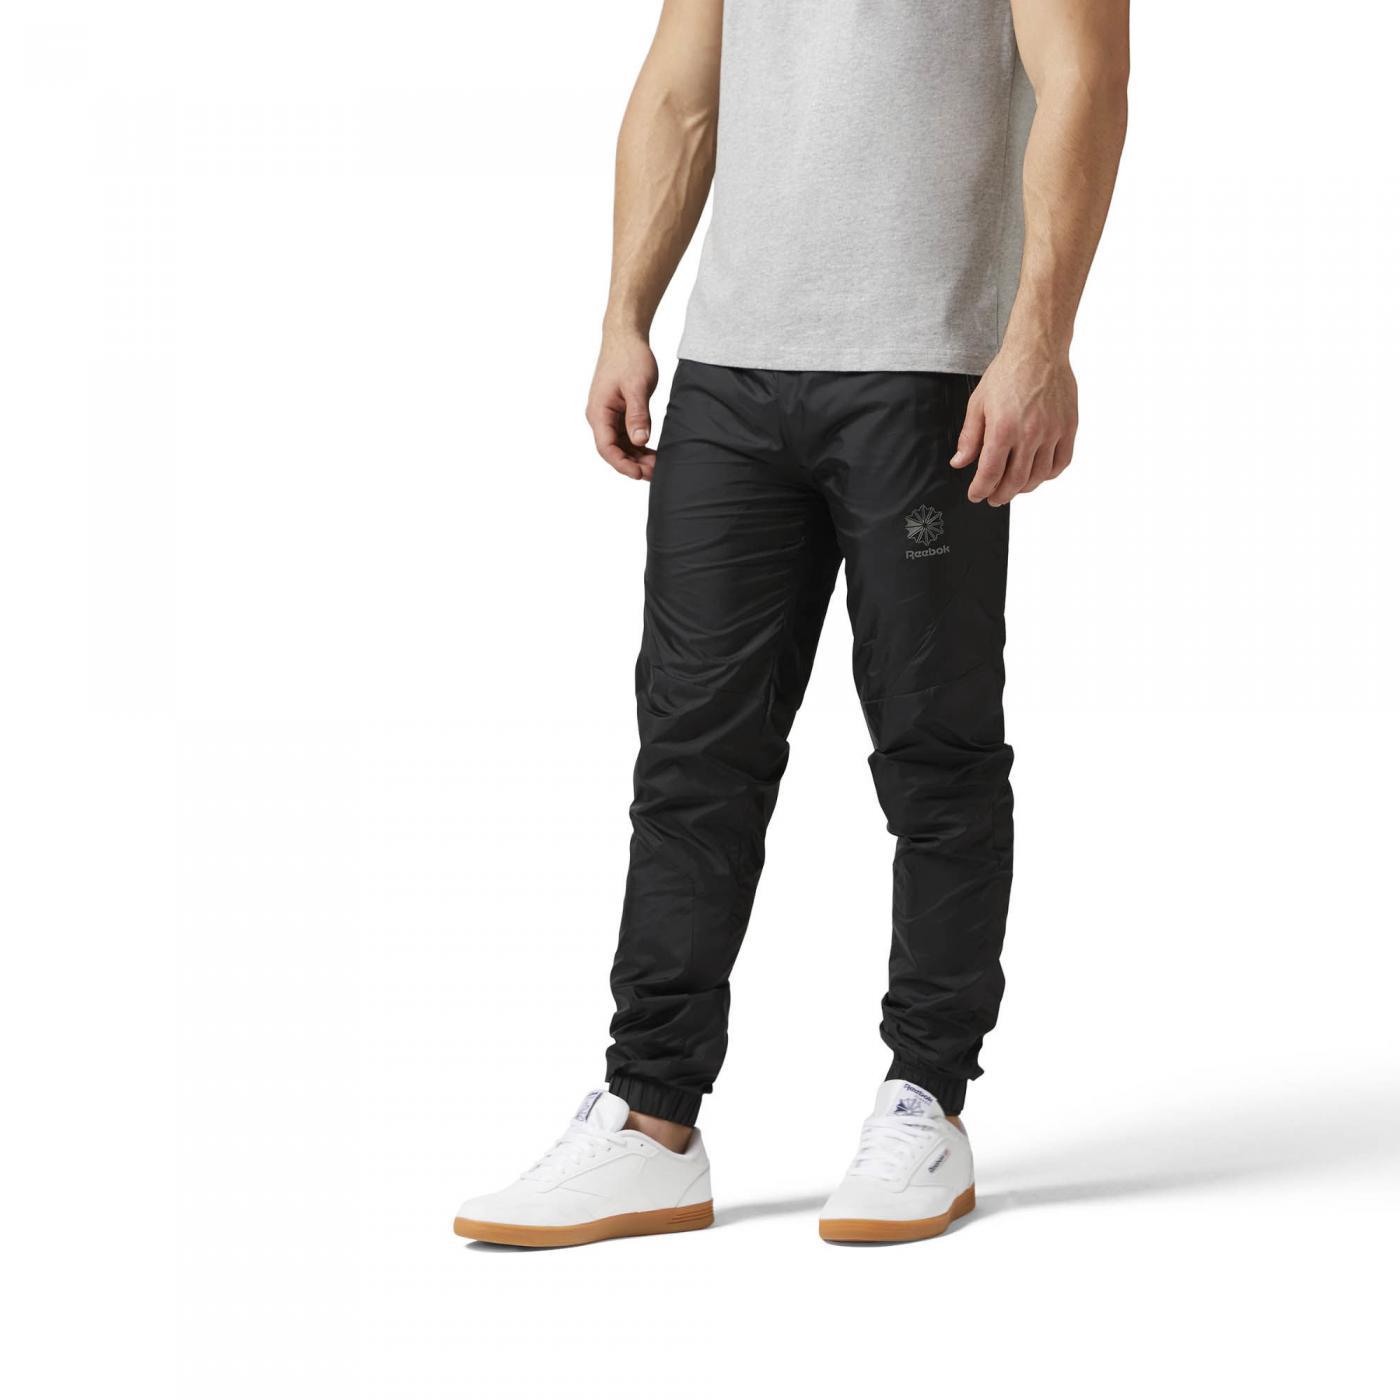 Buy Pantalones Reebok Ufc Up To 79 Off